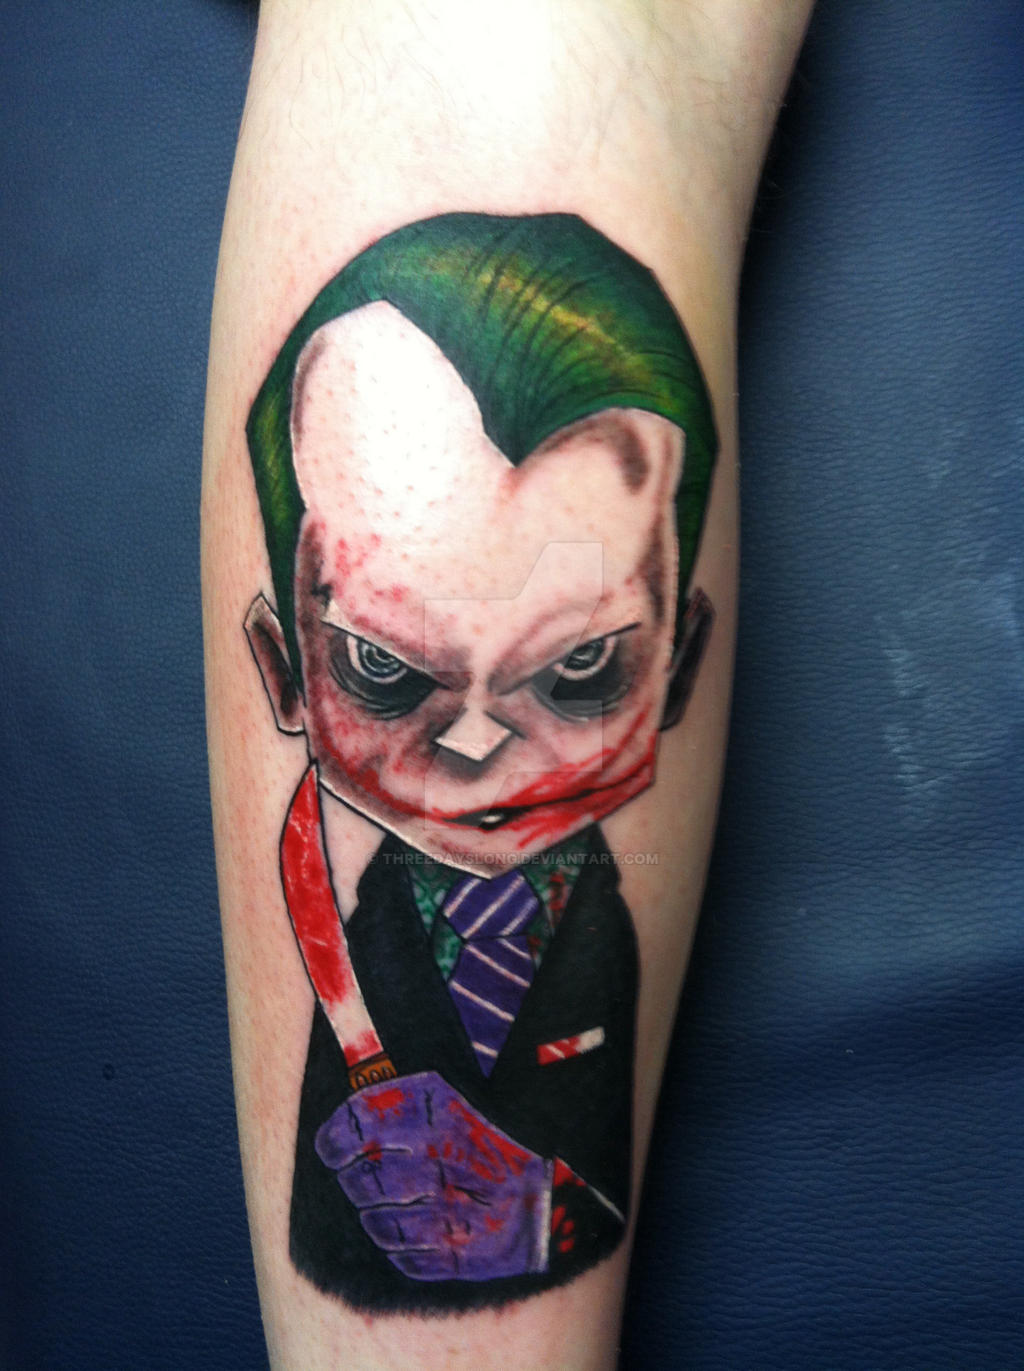 Joker tattoo by threedayslong on deviantart for The joker tattoo